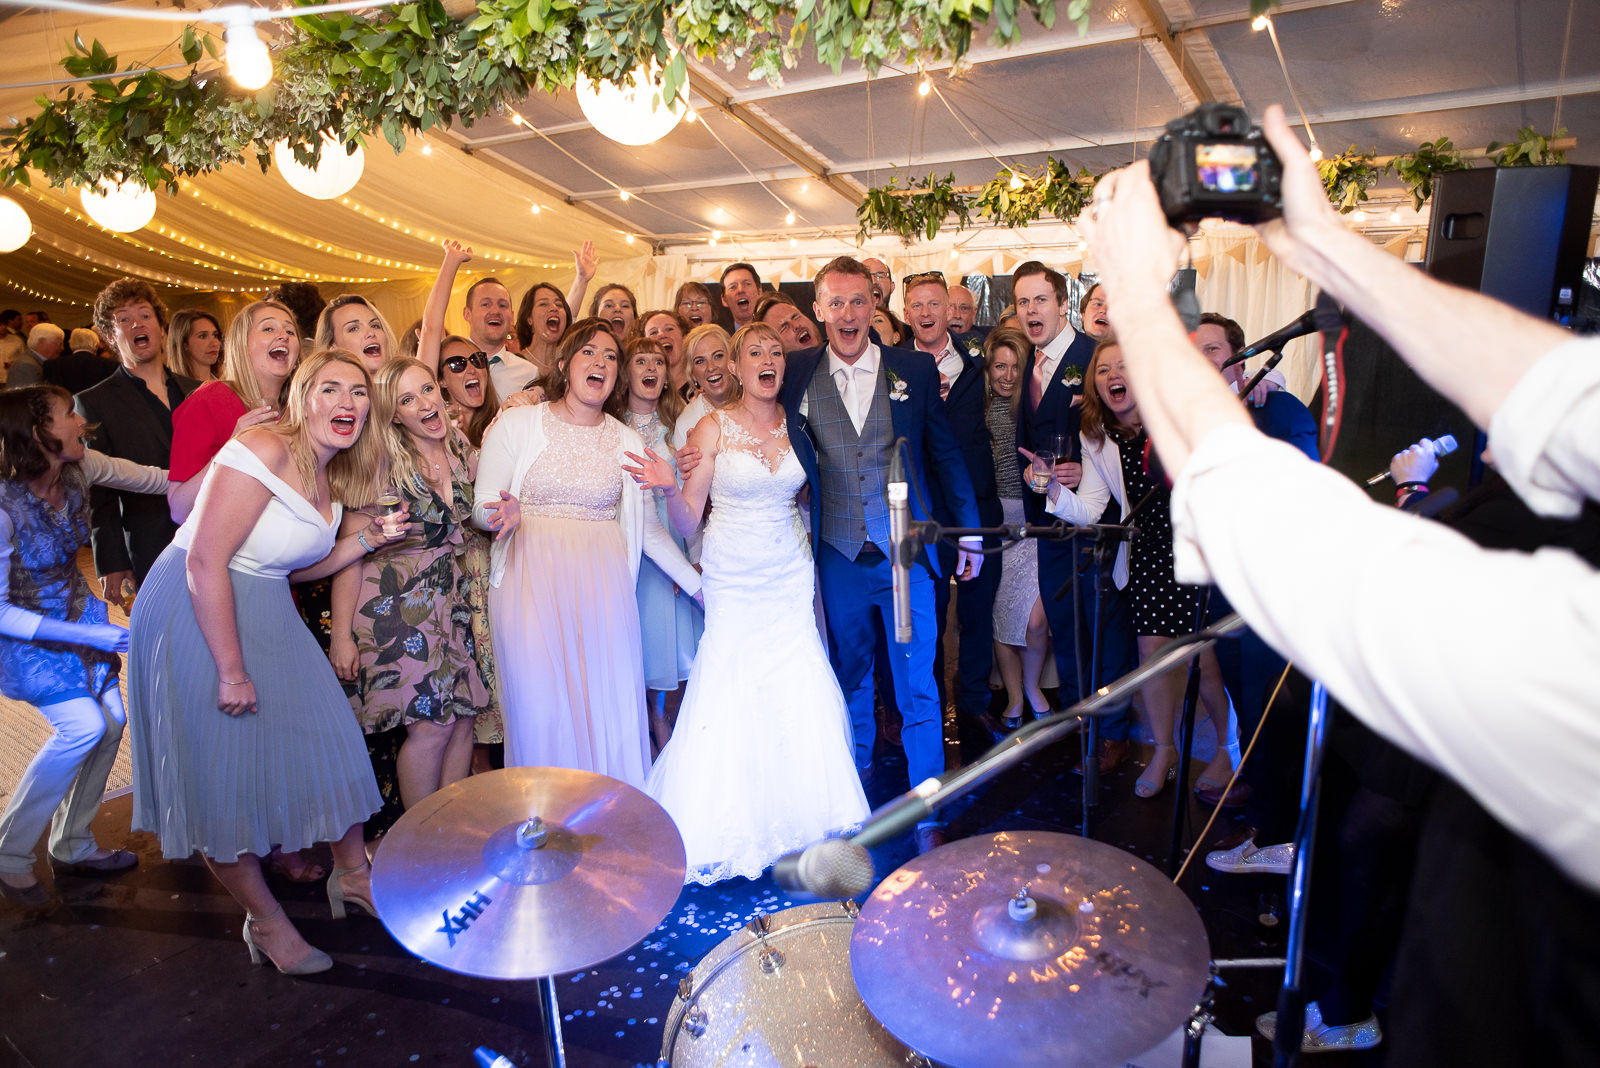 Roscarrock Farm wedding in Cornwall 089.jpg